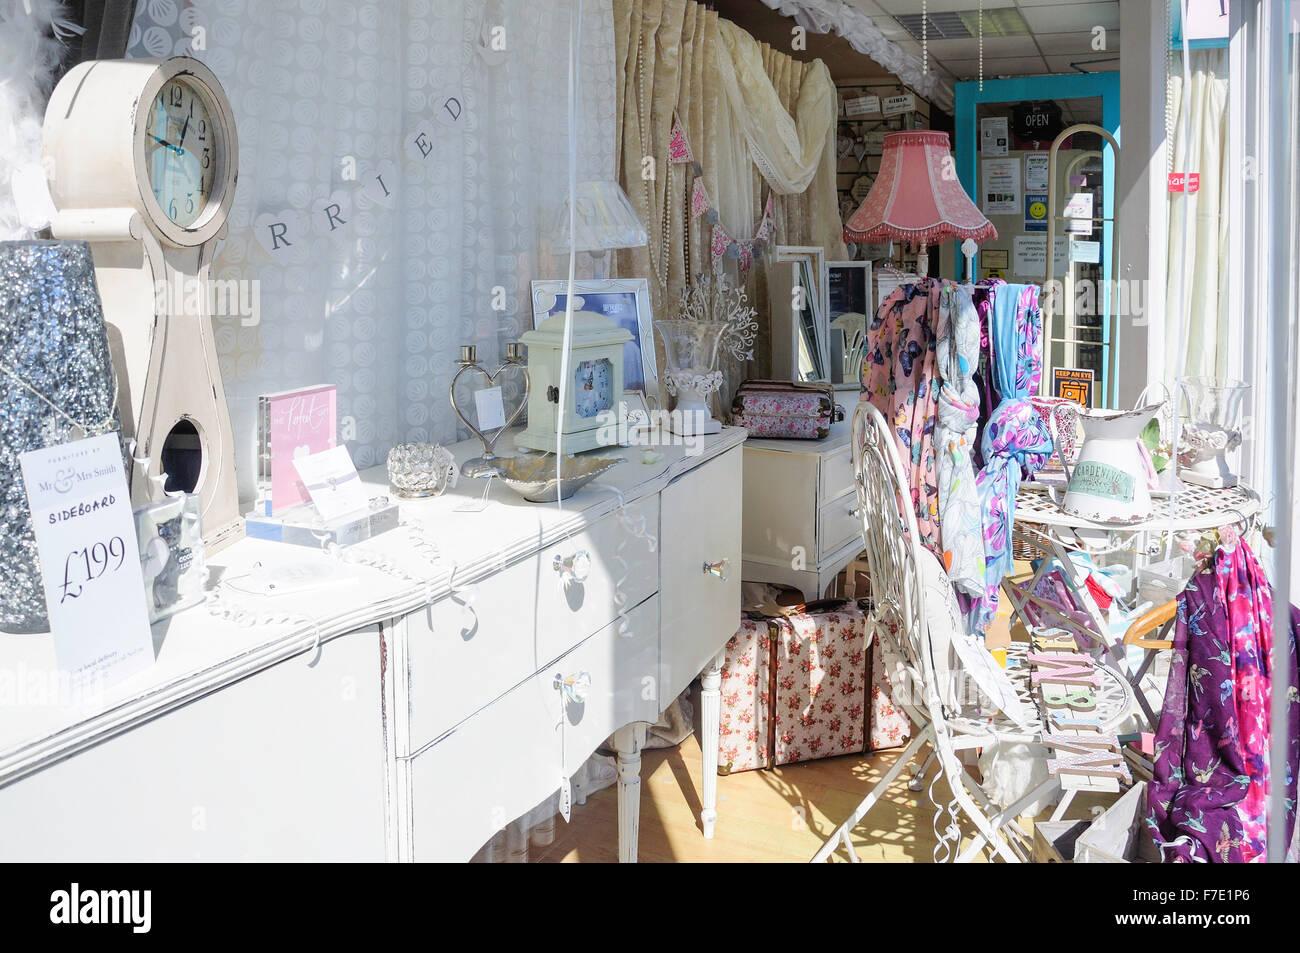 Window display of furnishing store, High Street, Rayleigh, Essex, England, United Kingdom - Stock Image